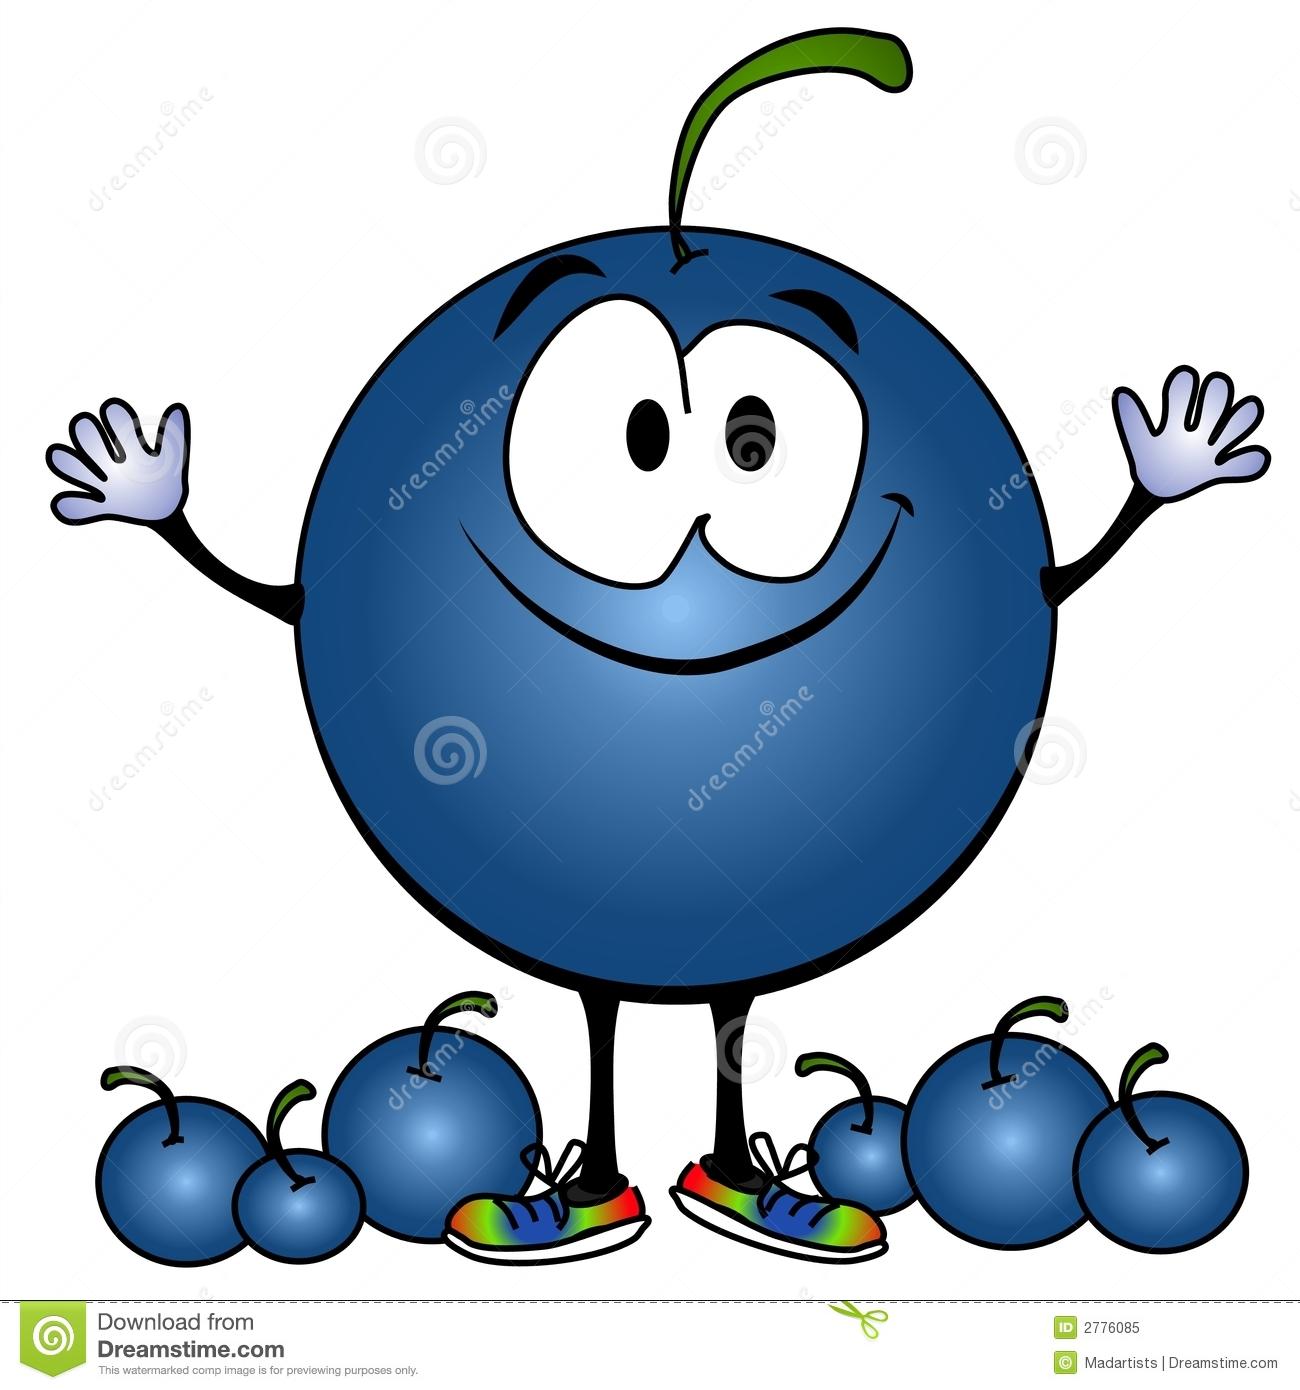 Smiling Blueberry Cartoon Face Royalty Free Stock Photo.